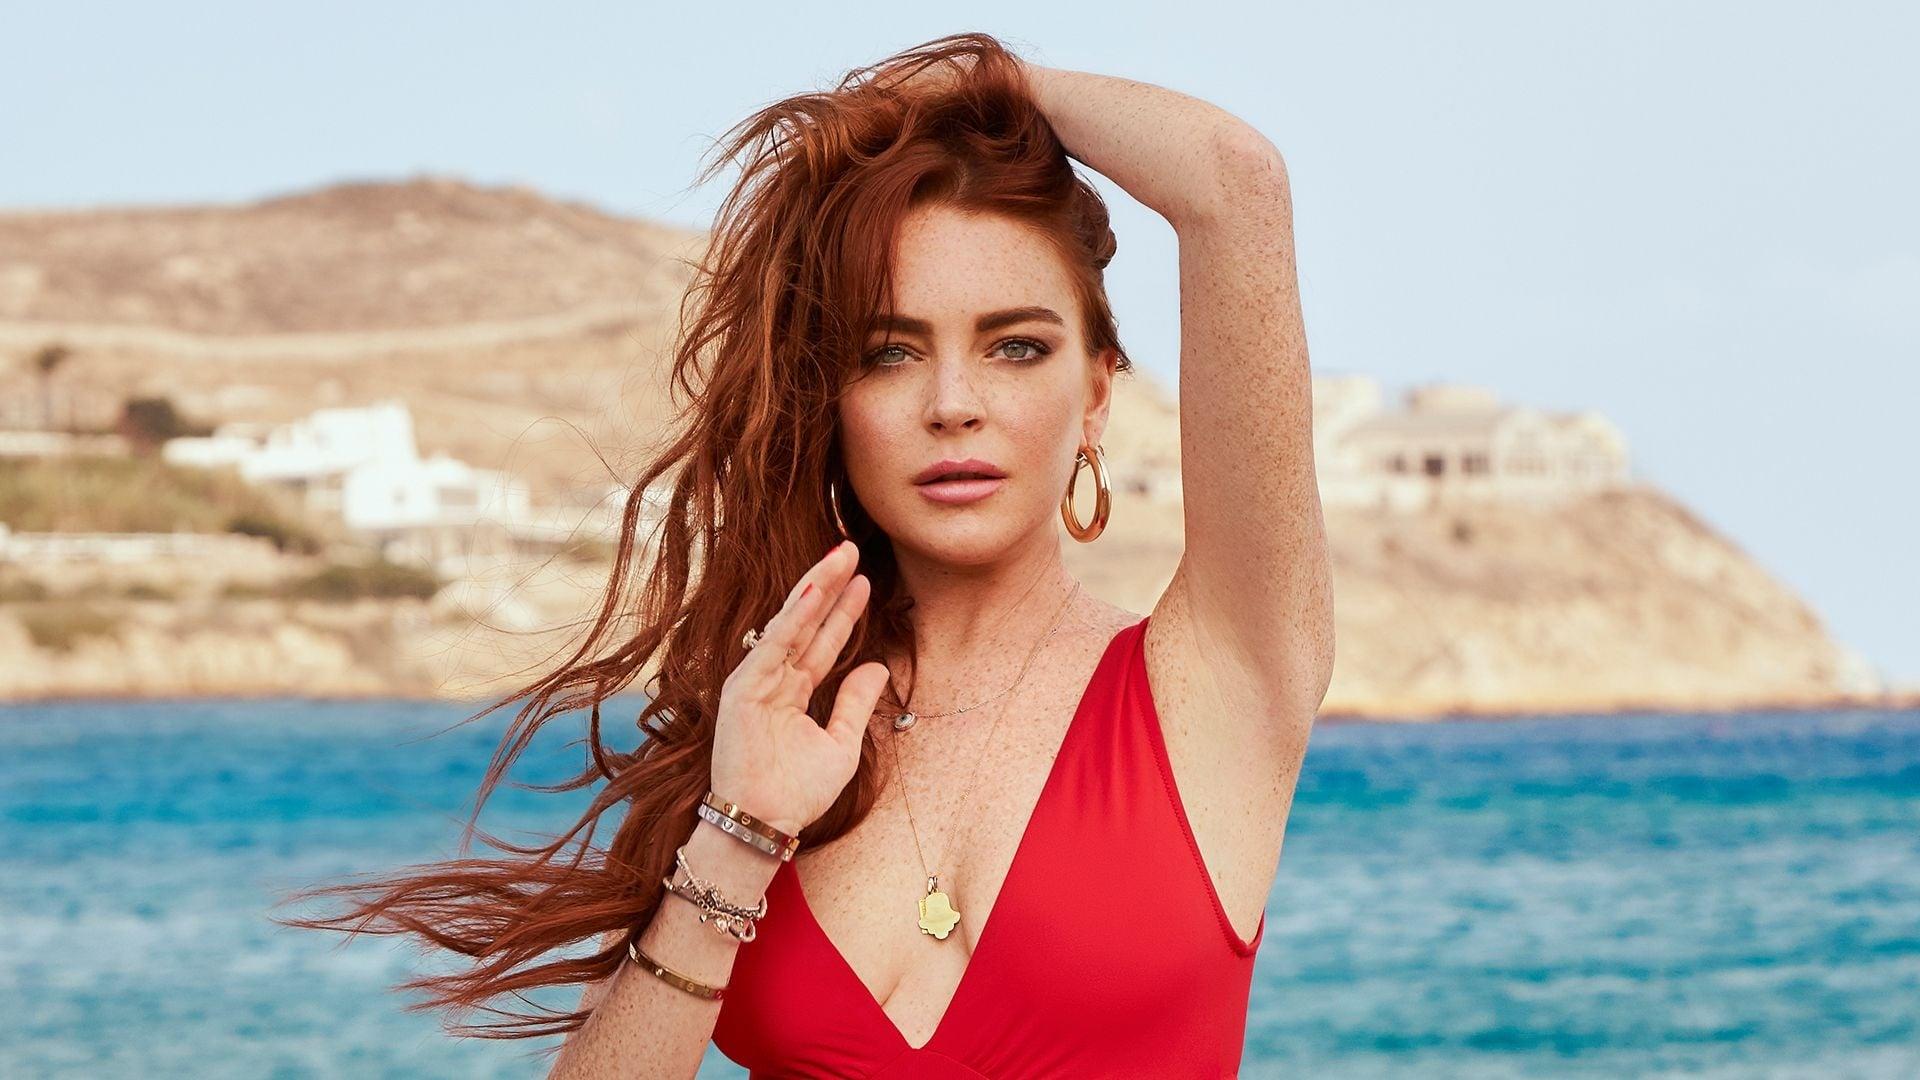 Lindsay Lohan's Beach Club Season 1 Episode 11 : Mike Takes It Too Far